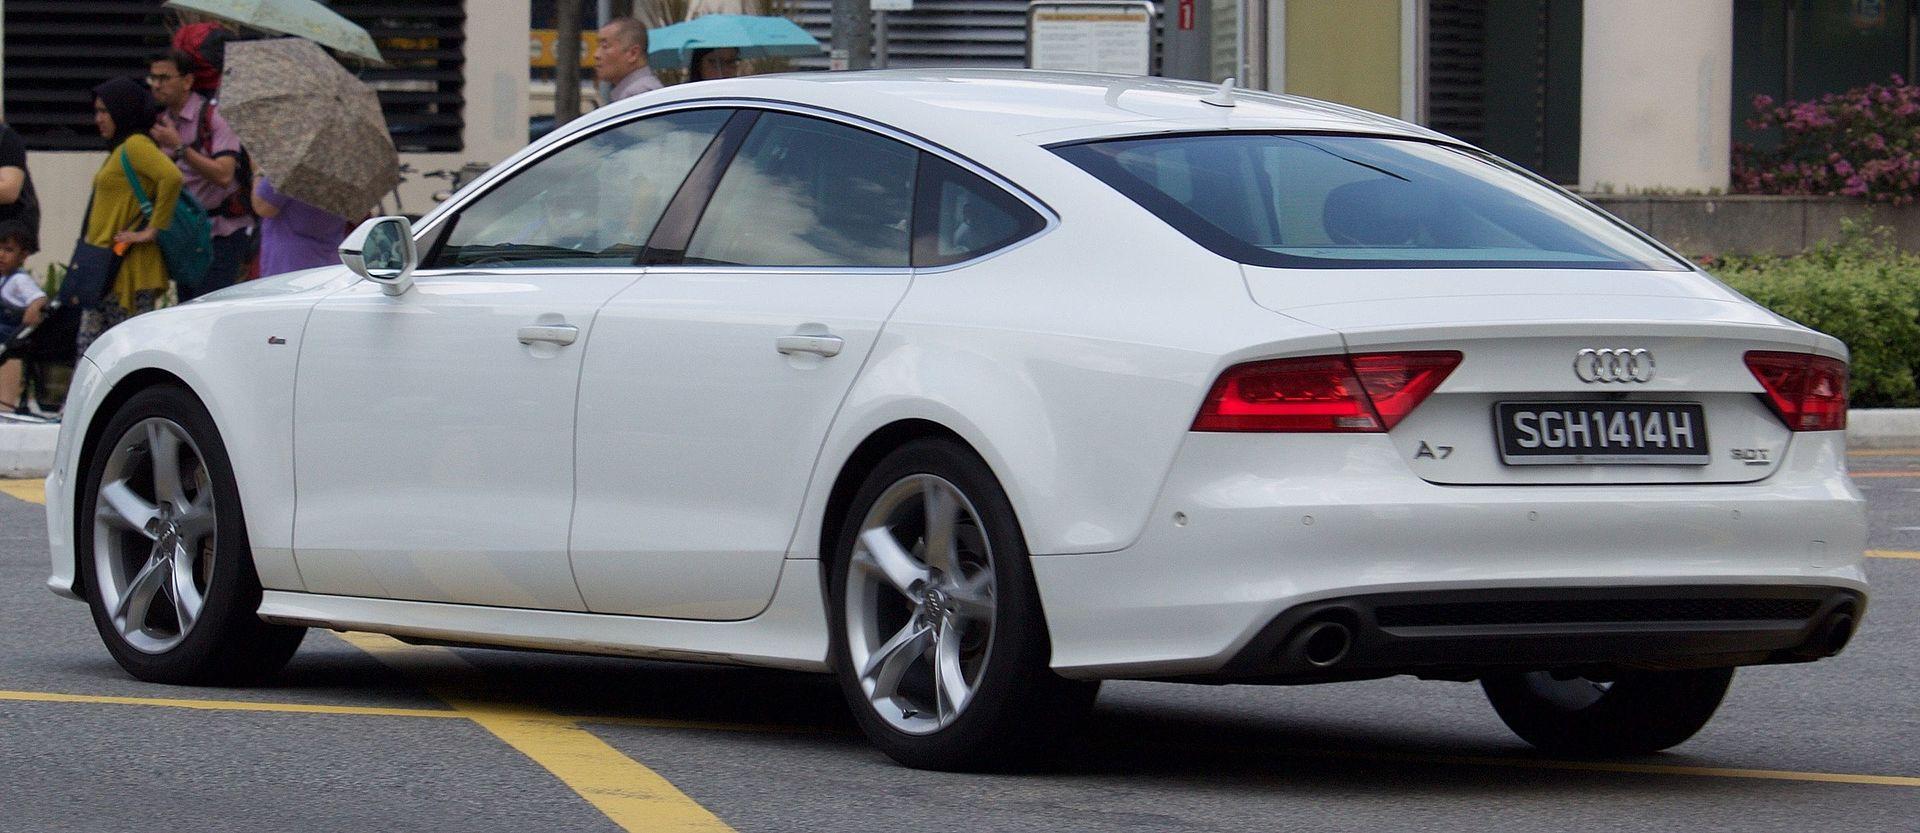 2011_Audi_A7_(4G)_3.0_TFSI_quattro_hatchback_(2016-01-07)_02.jpg.b3c09fdb9491f29da0478bc6e6b4ee77.jpg